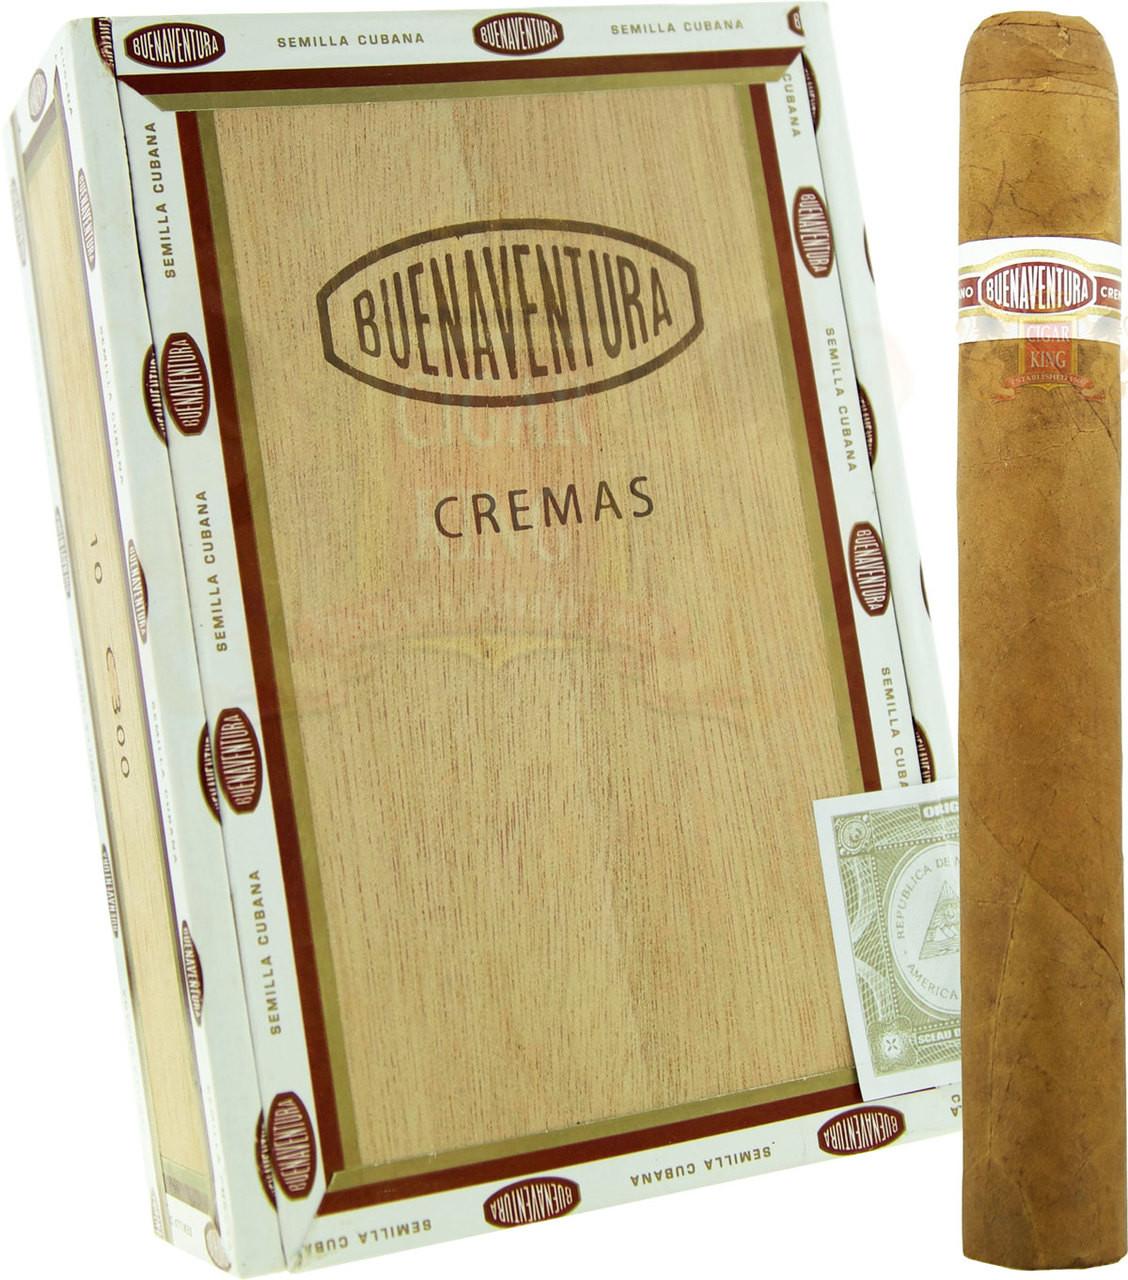 Curivari Buenaventura Cremas C300 (6x52 / Box 10)